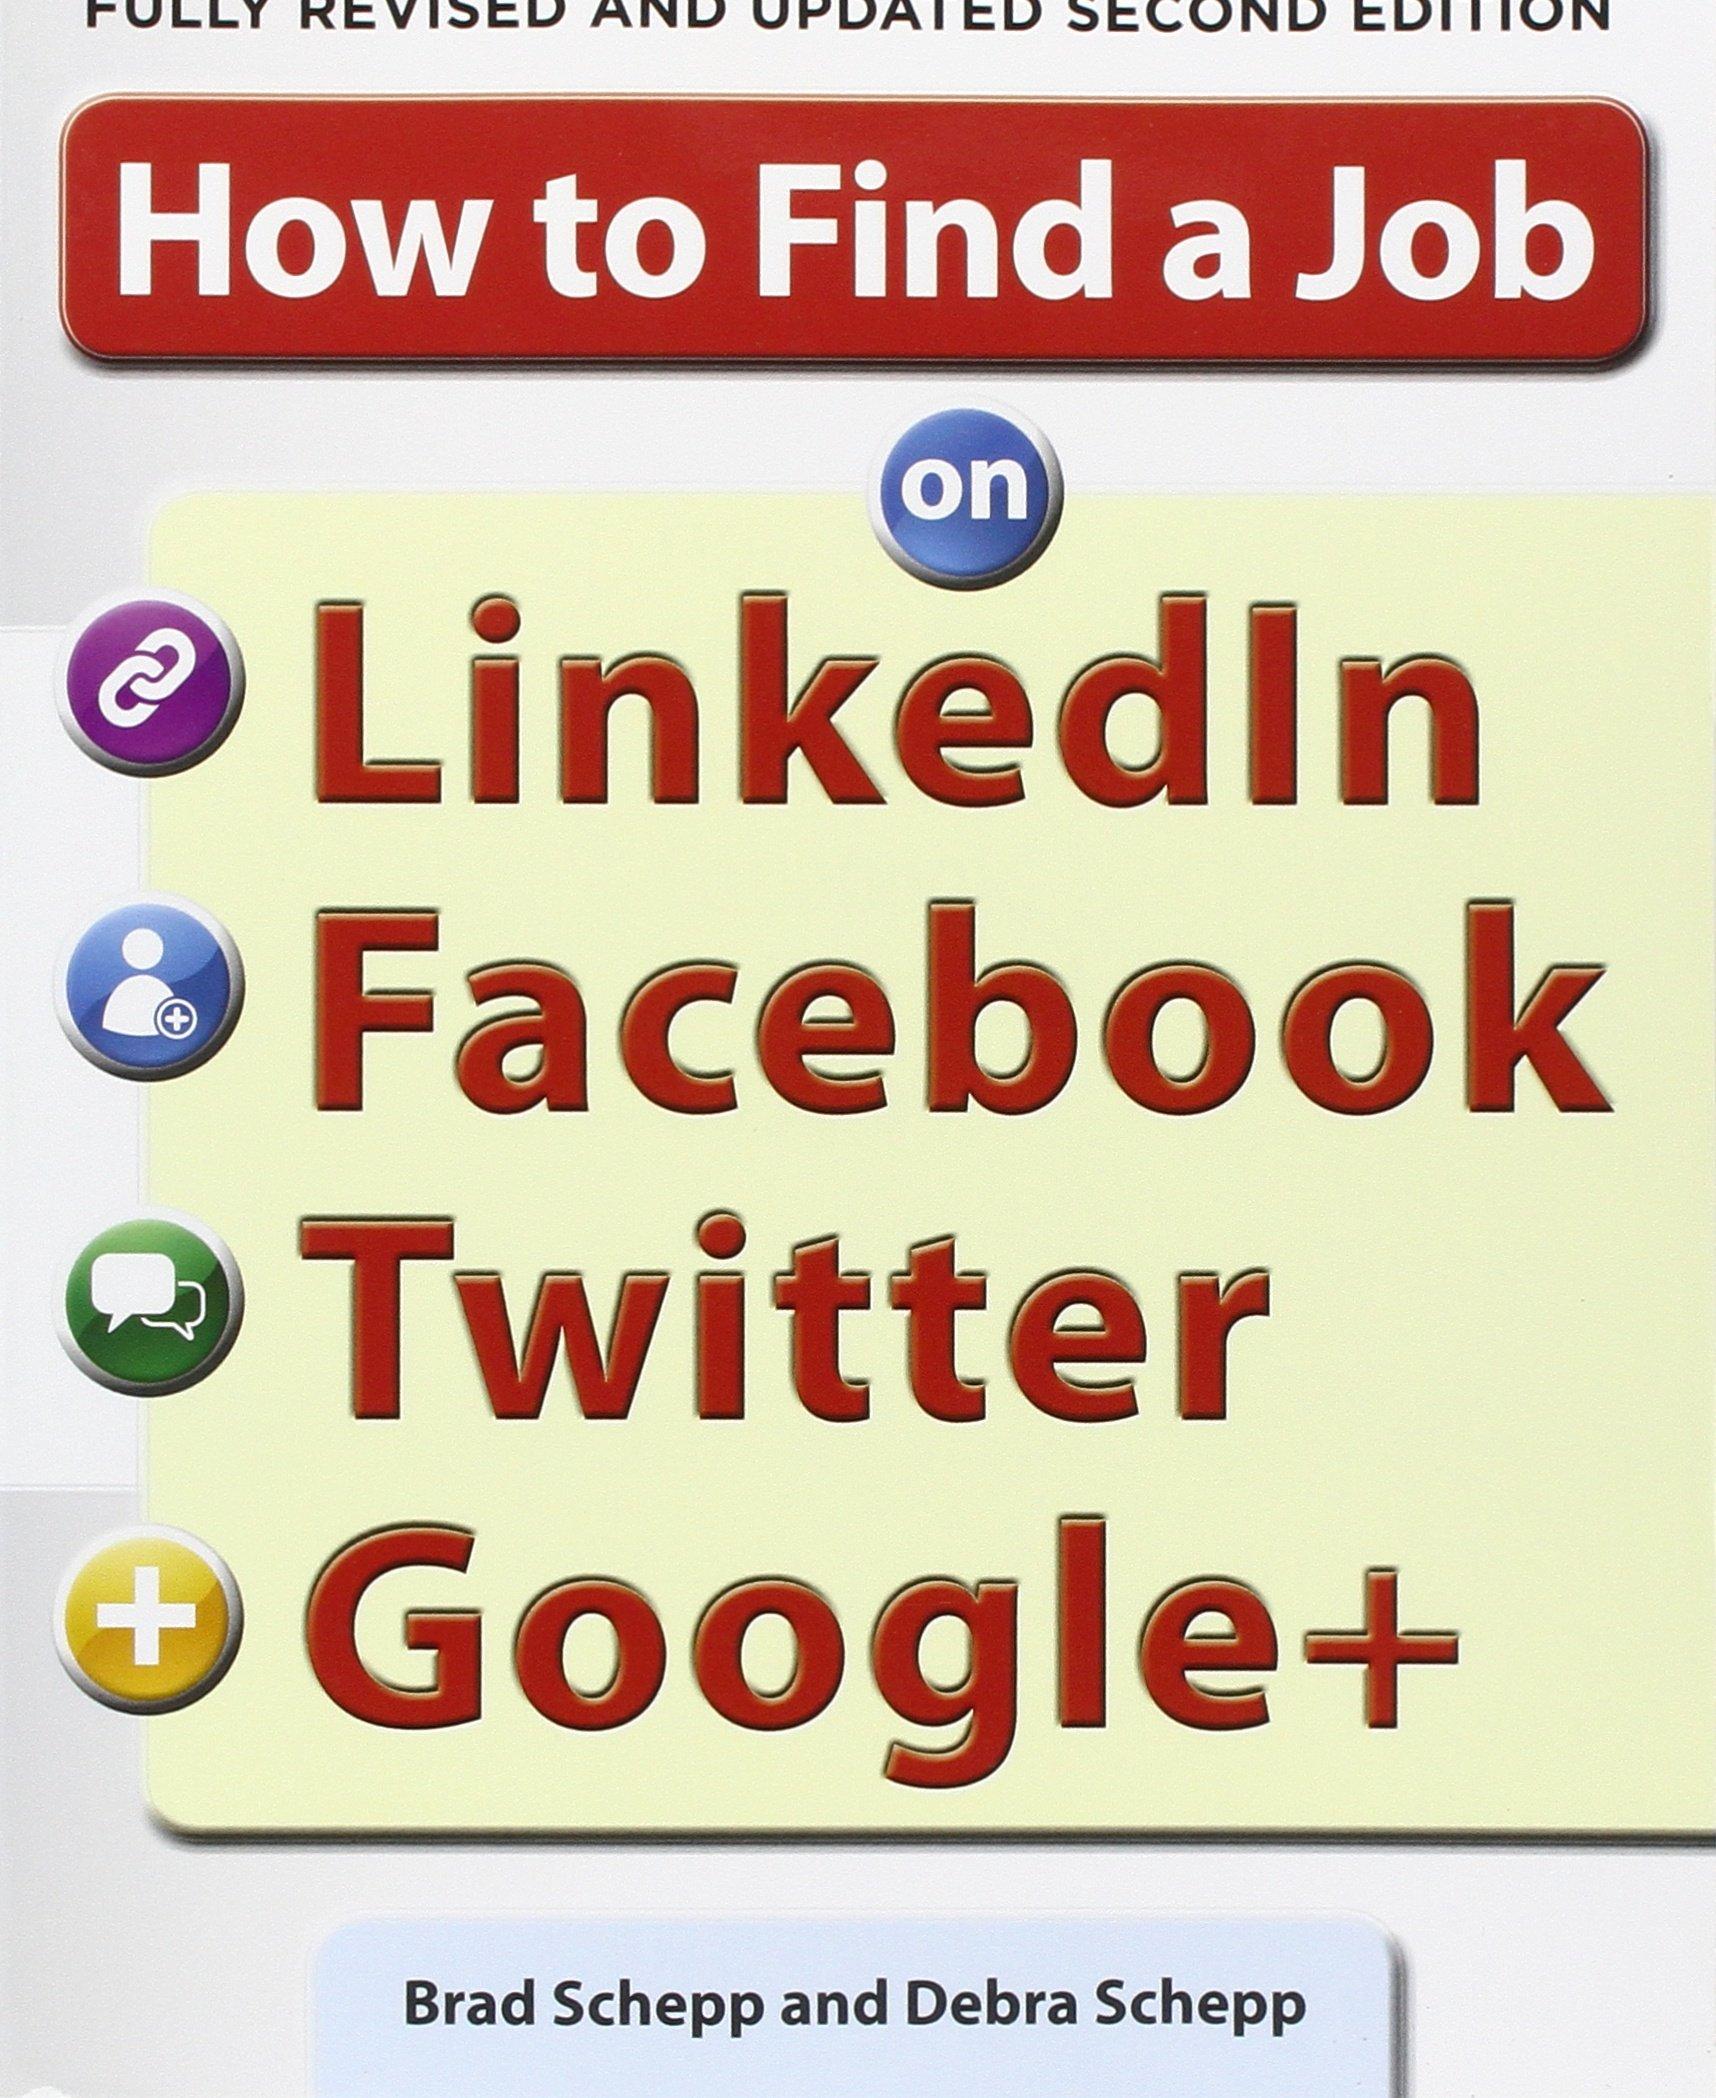 how to a job on linkedin facebook twitter and google 2 e how to a job on linkedin facebook twitter and google 2 e business books brad schepp debra schepp 9780071790437 amazon com books